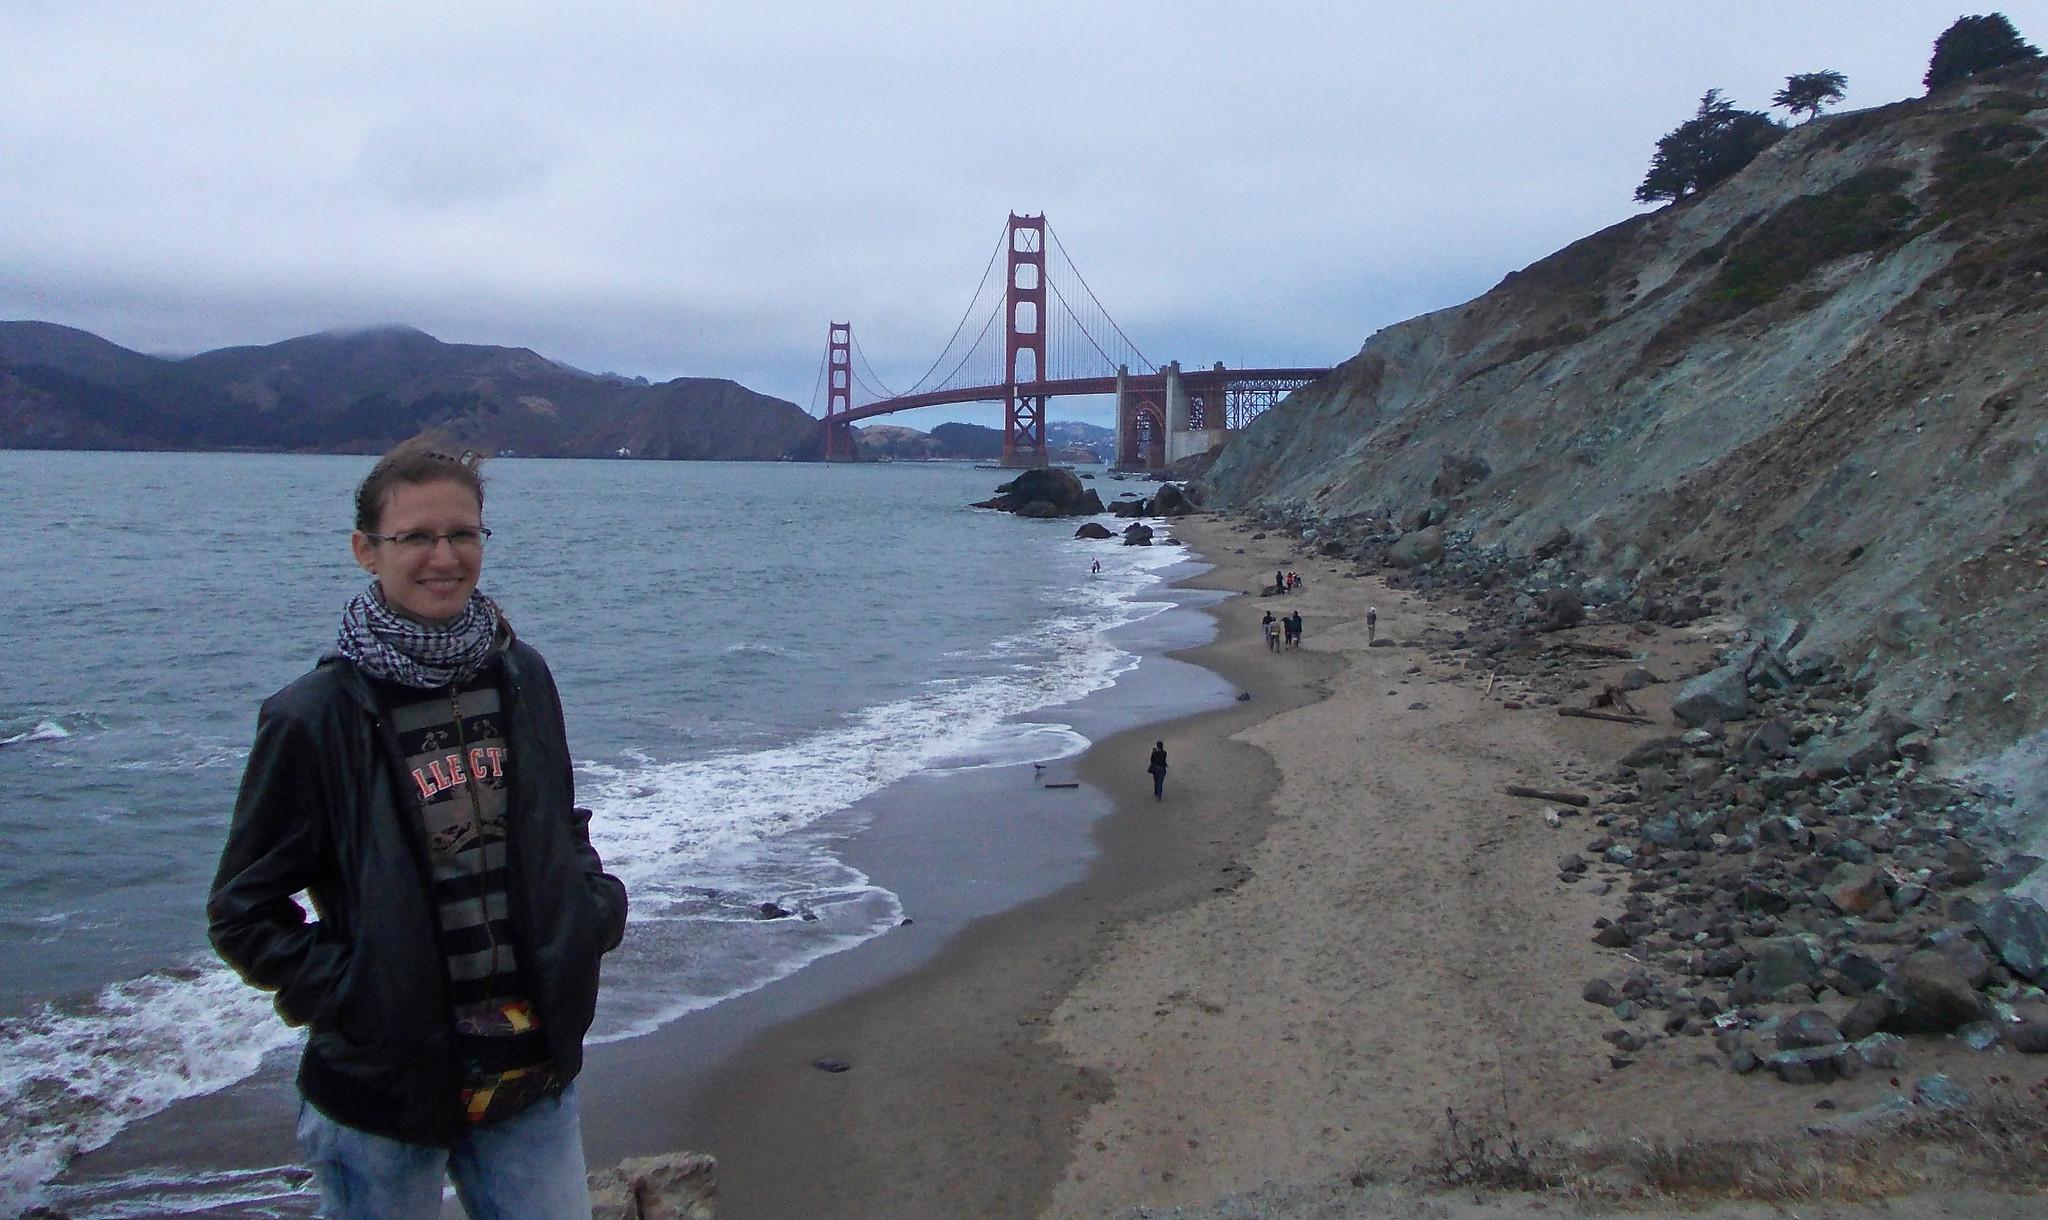 Baker Beach, San Francisco, CA, USA